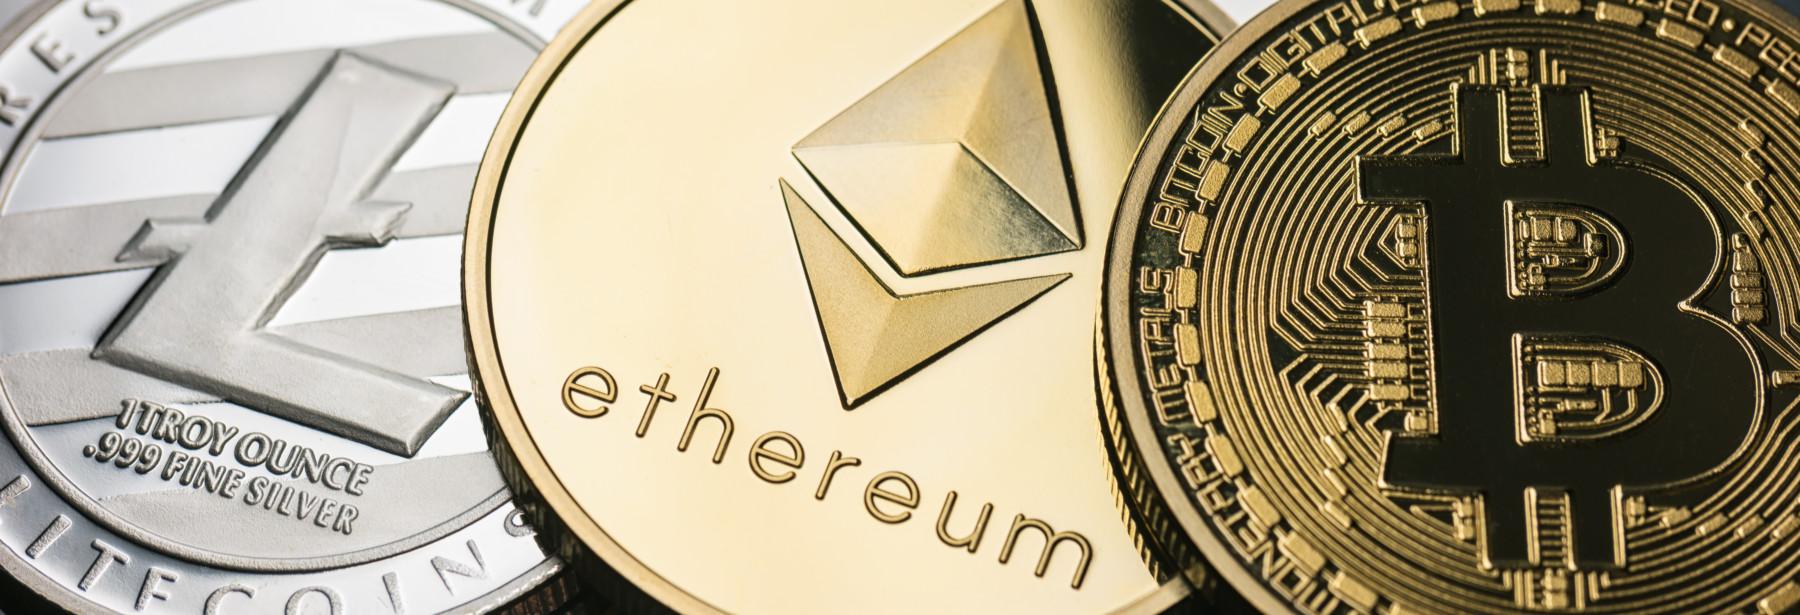 Bitcoin, Litecoin and Ethereum Cryptocurrencies